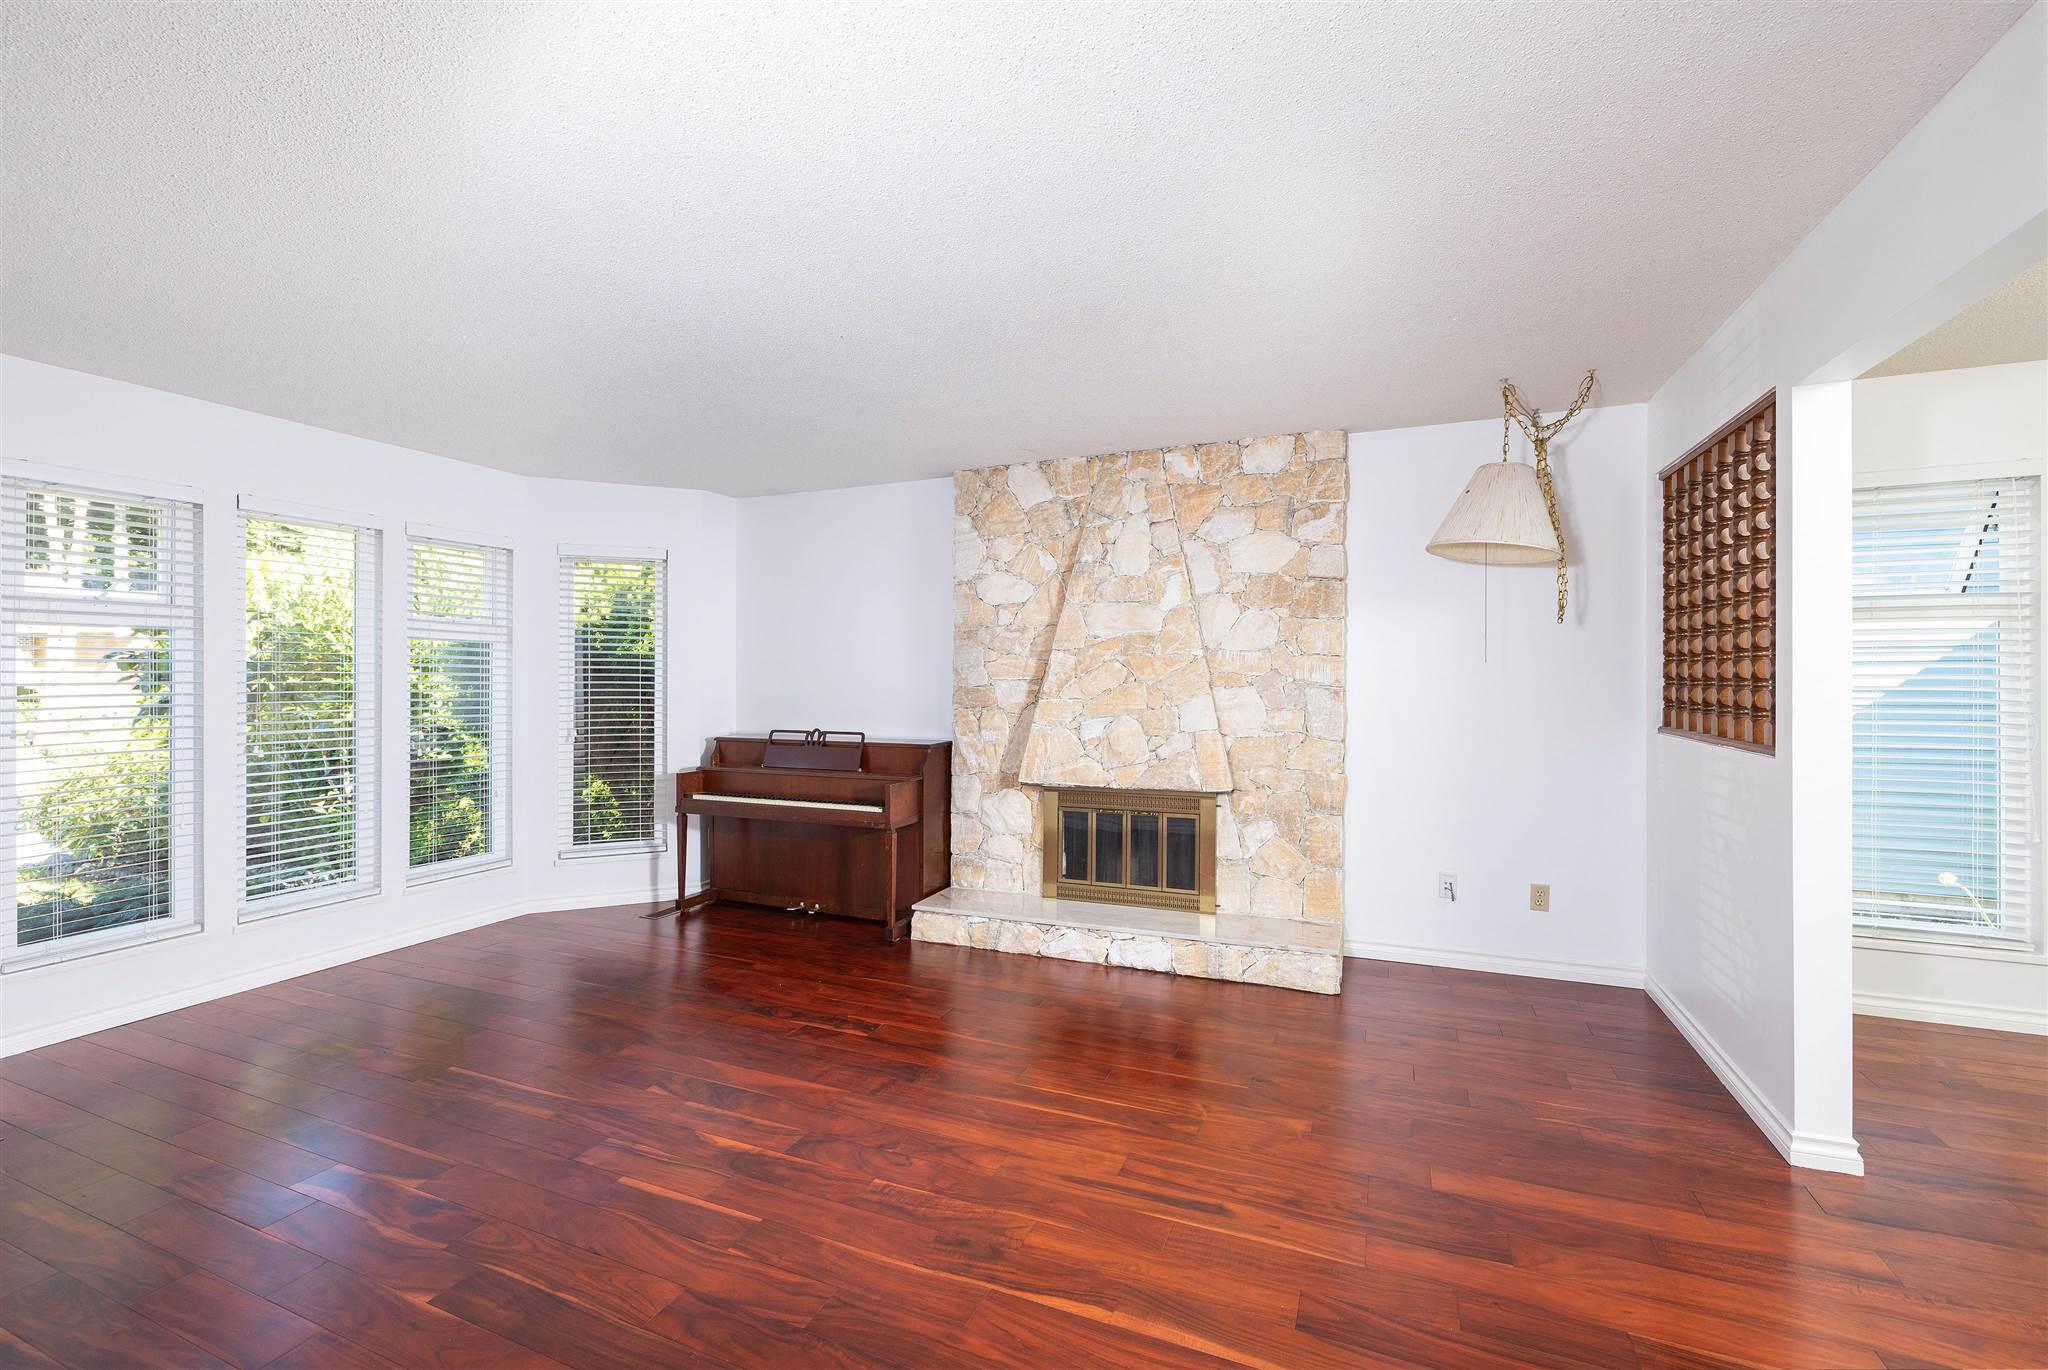 1743 148A STREET - Sunnyside Park Surrey House/Single Family for sale, 3 Bedrooms (R2604804) - #6